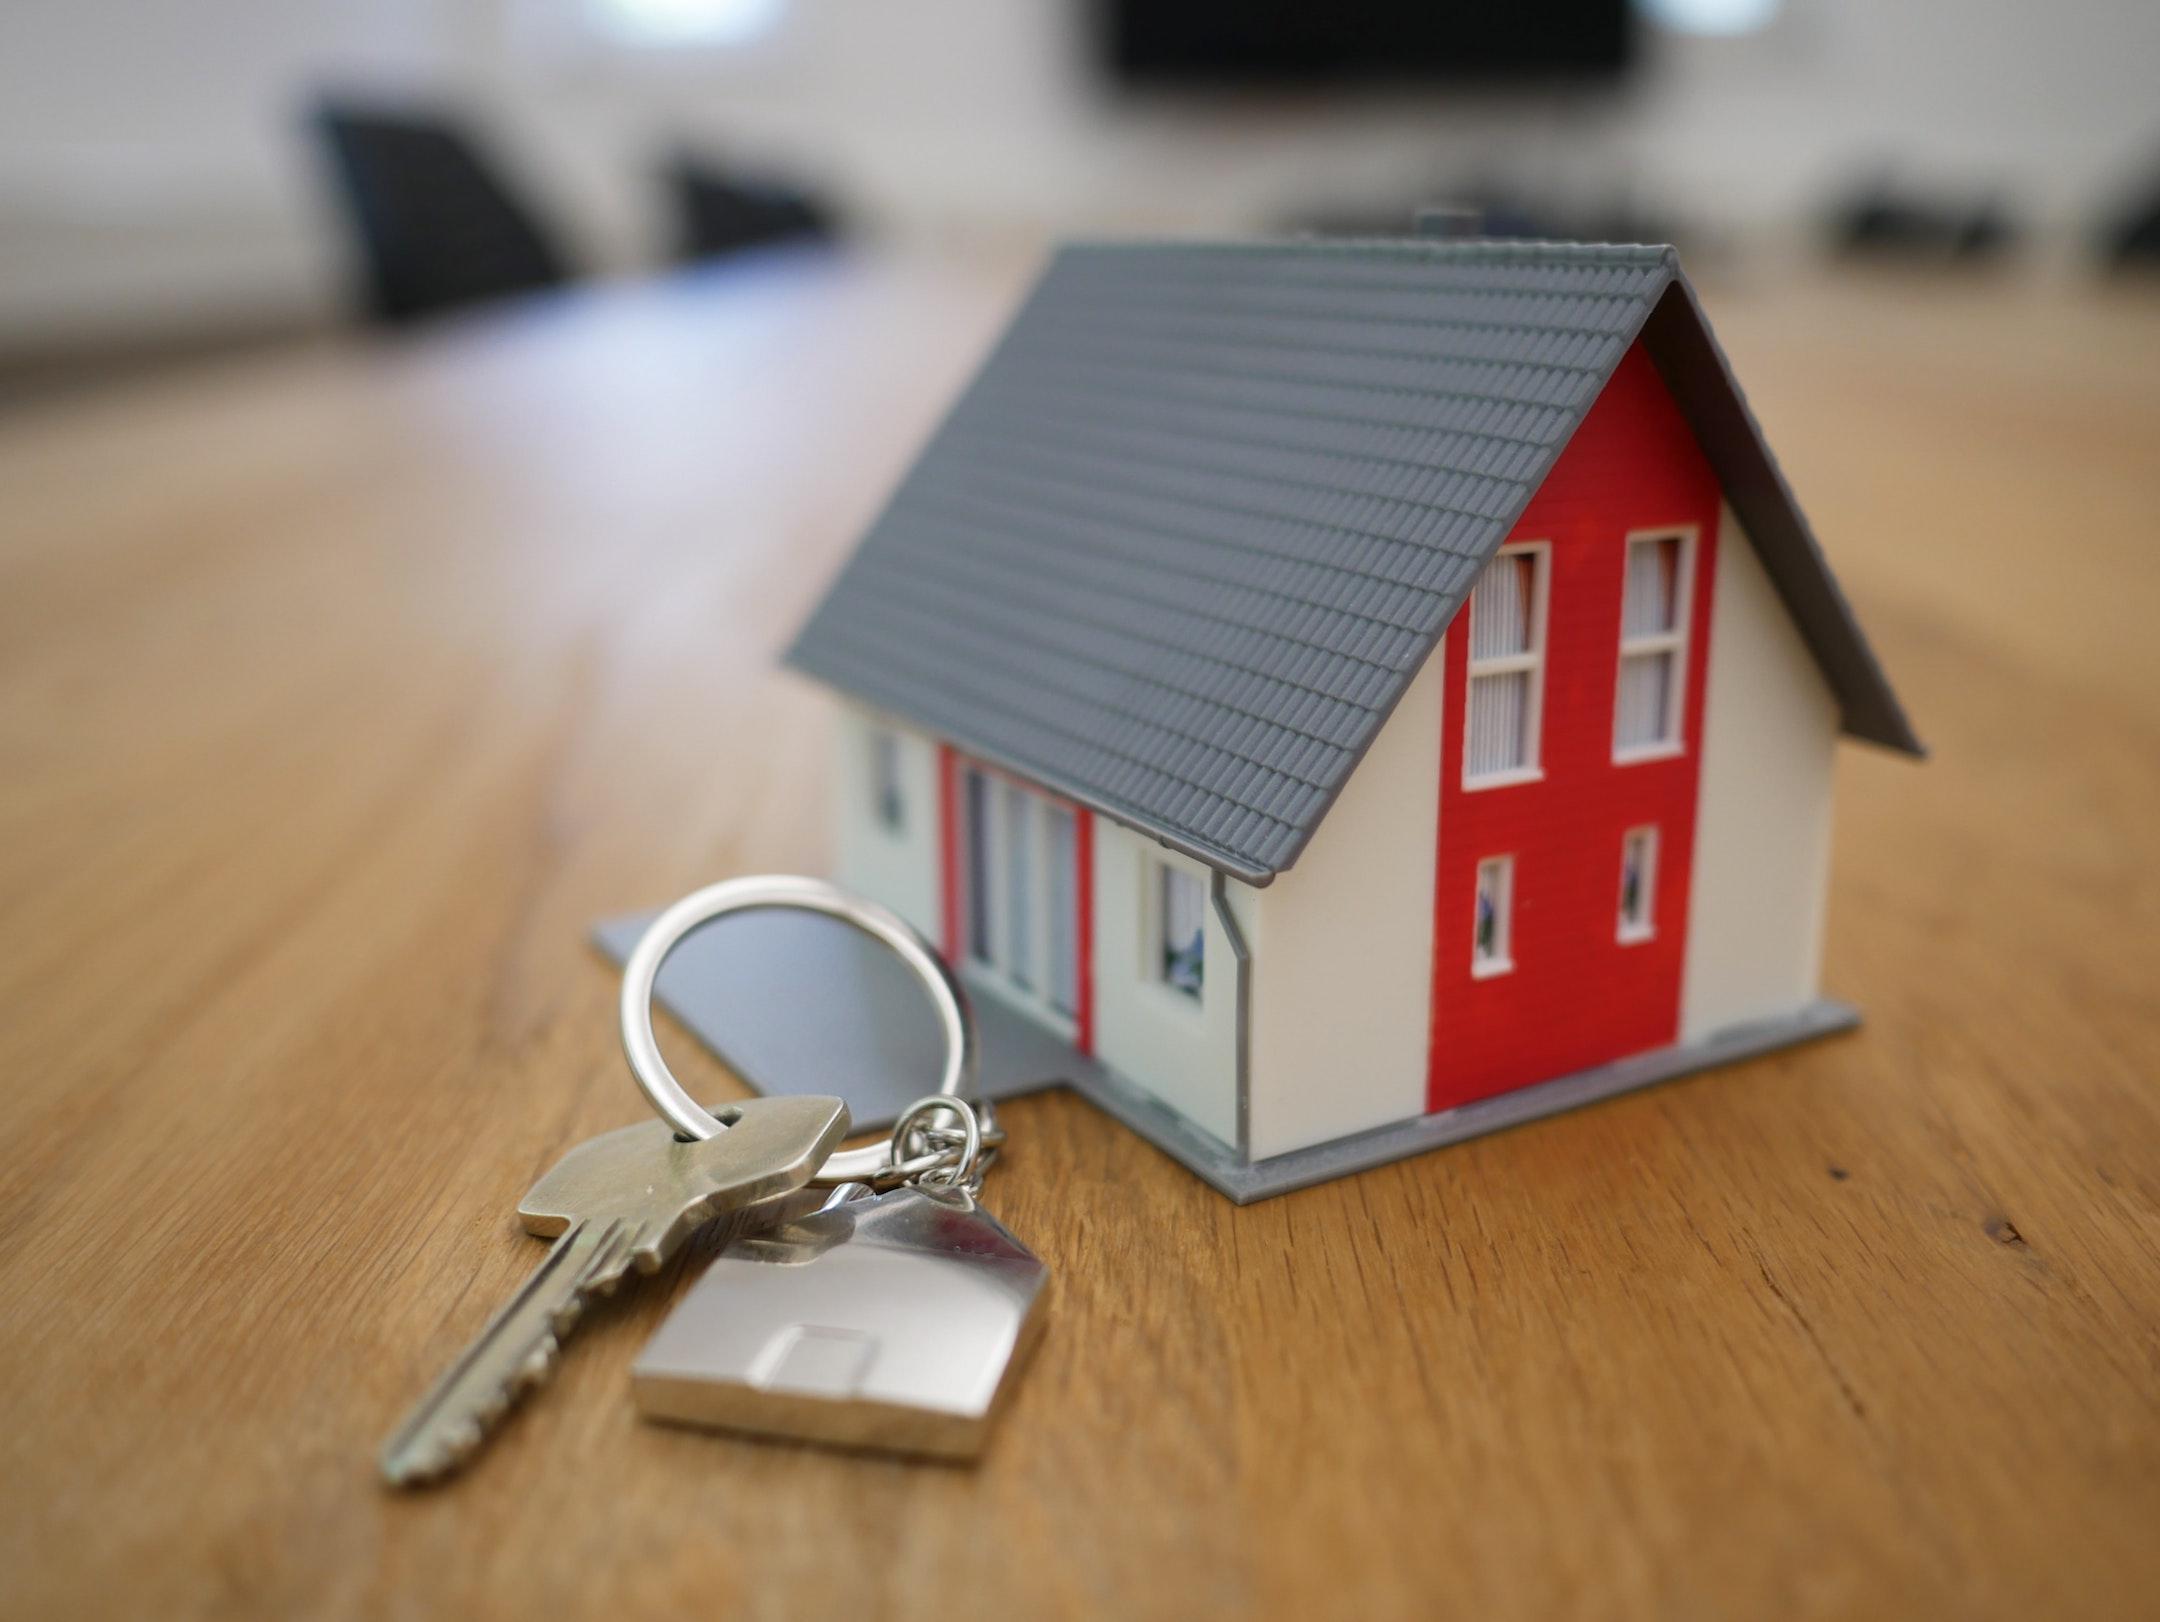 Miniature house with keys beside it